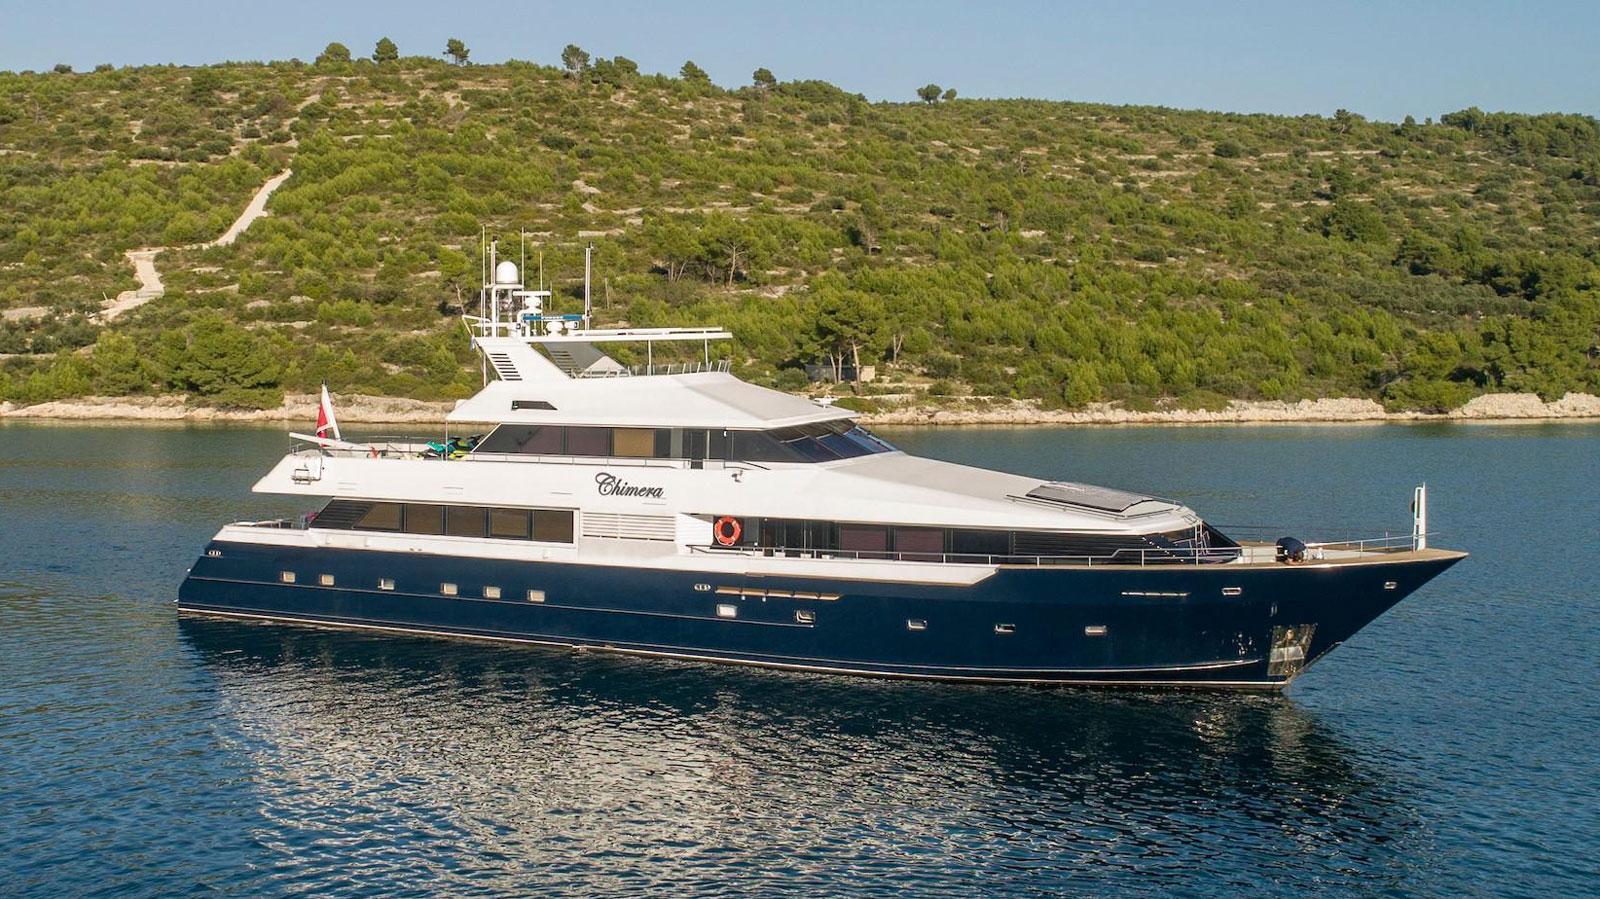 broward-motor-yacht-chimera-for-sale